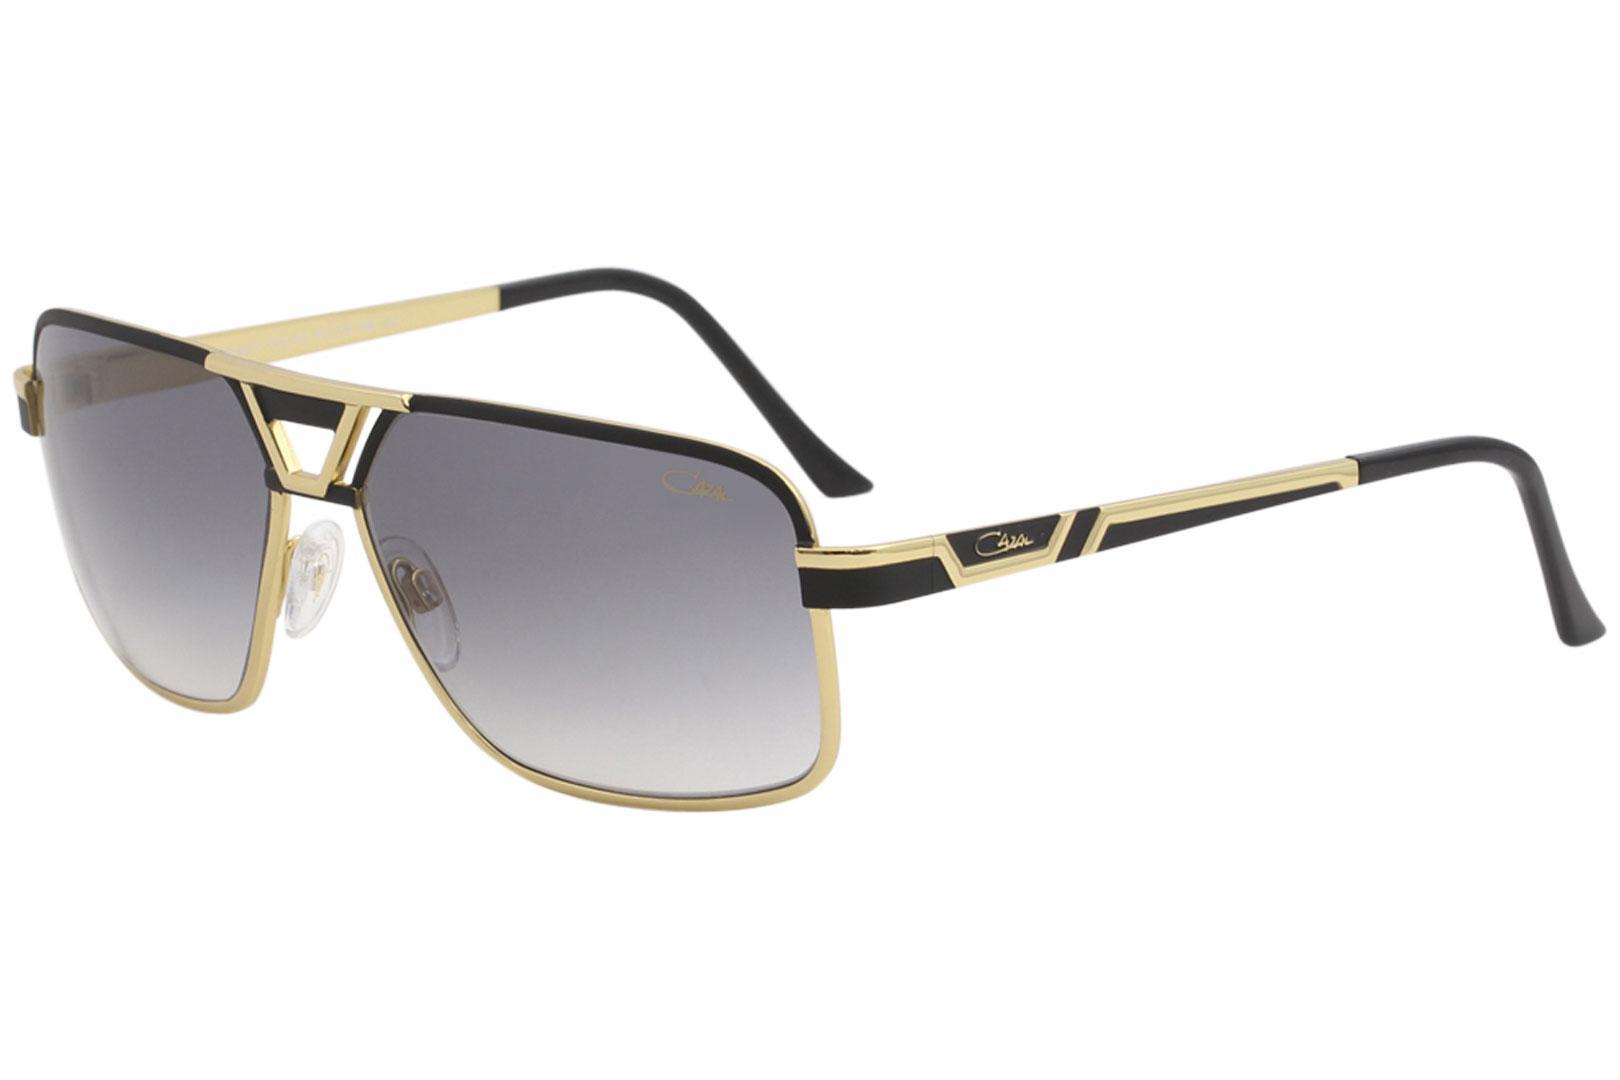 714b4ad614d Cazal Men s 9071 Retro Pilot Sunglasses